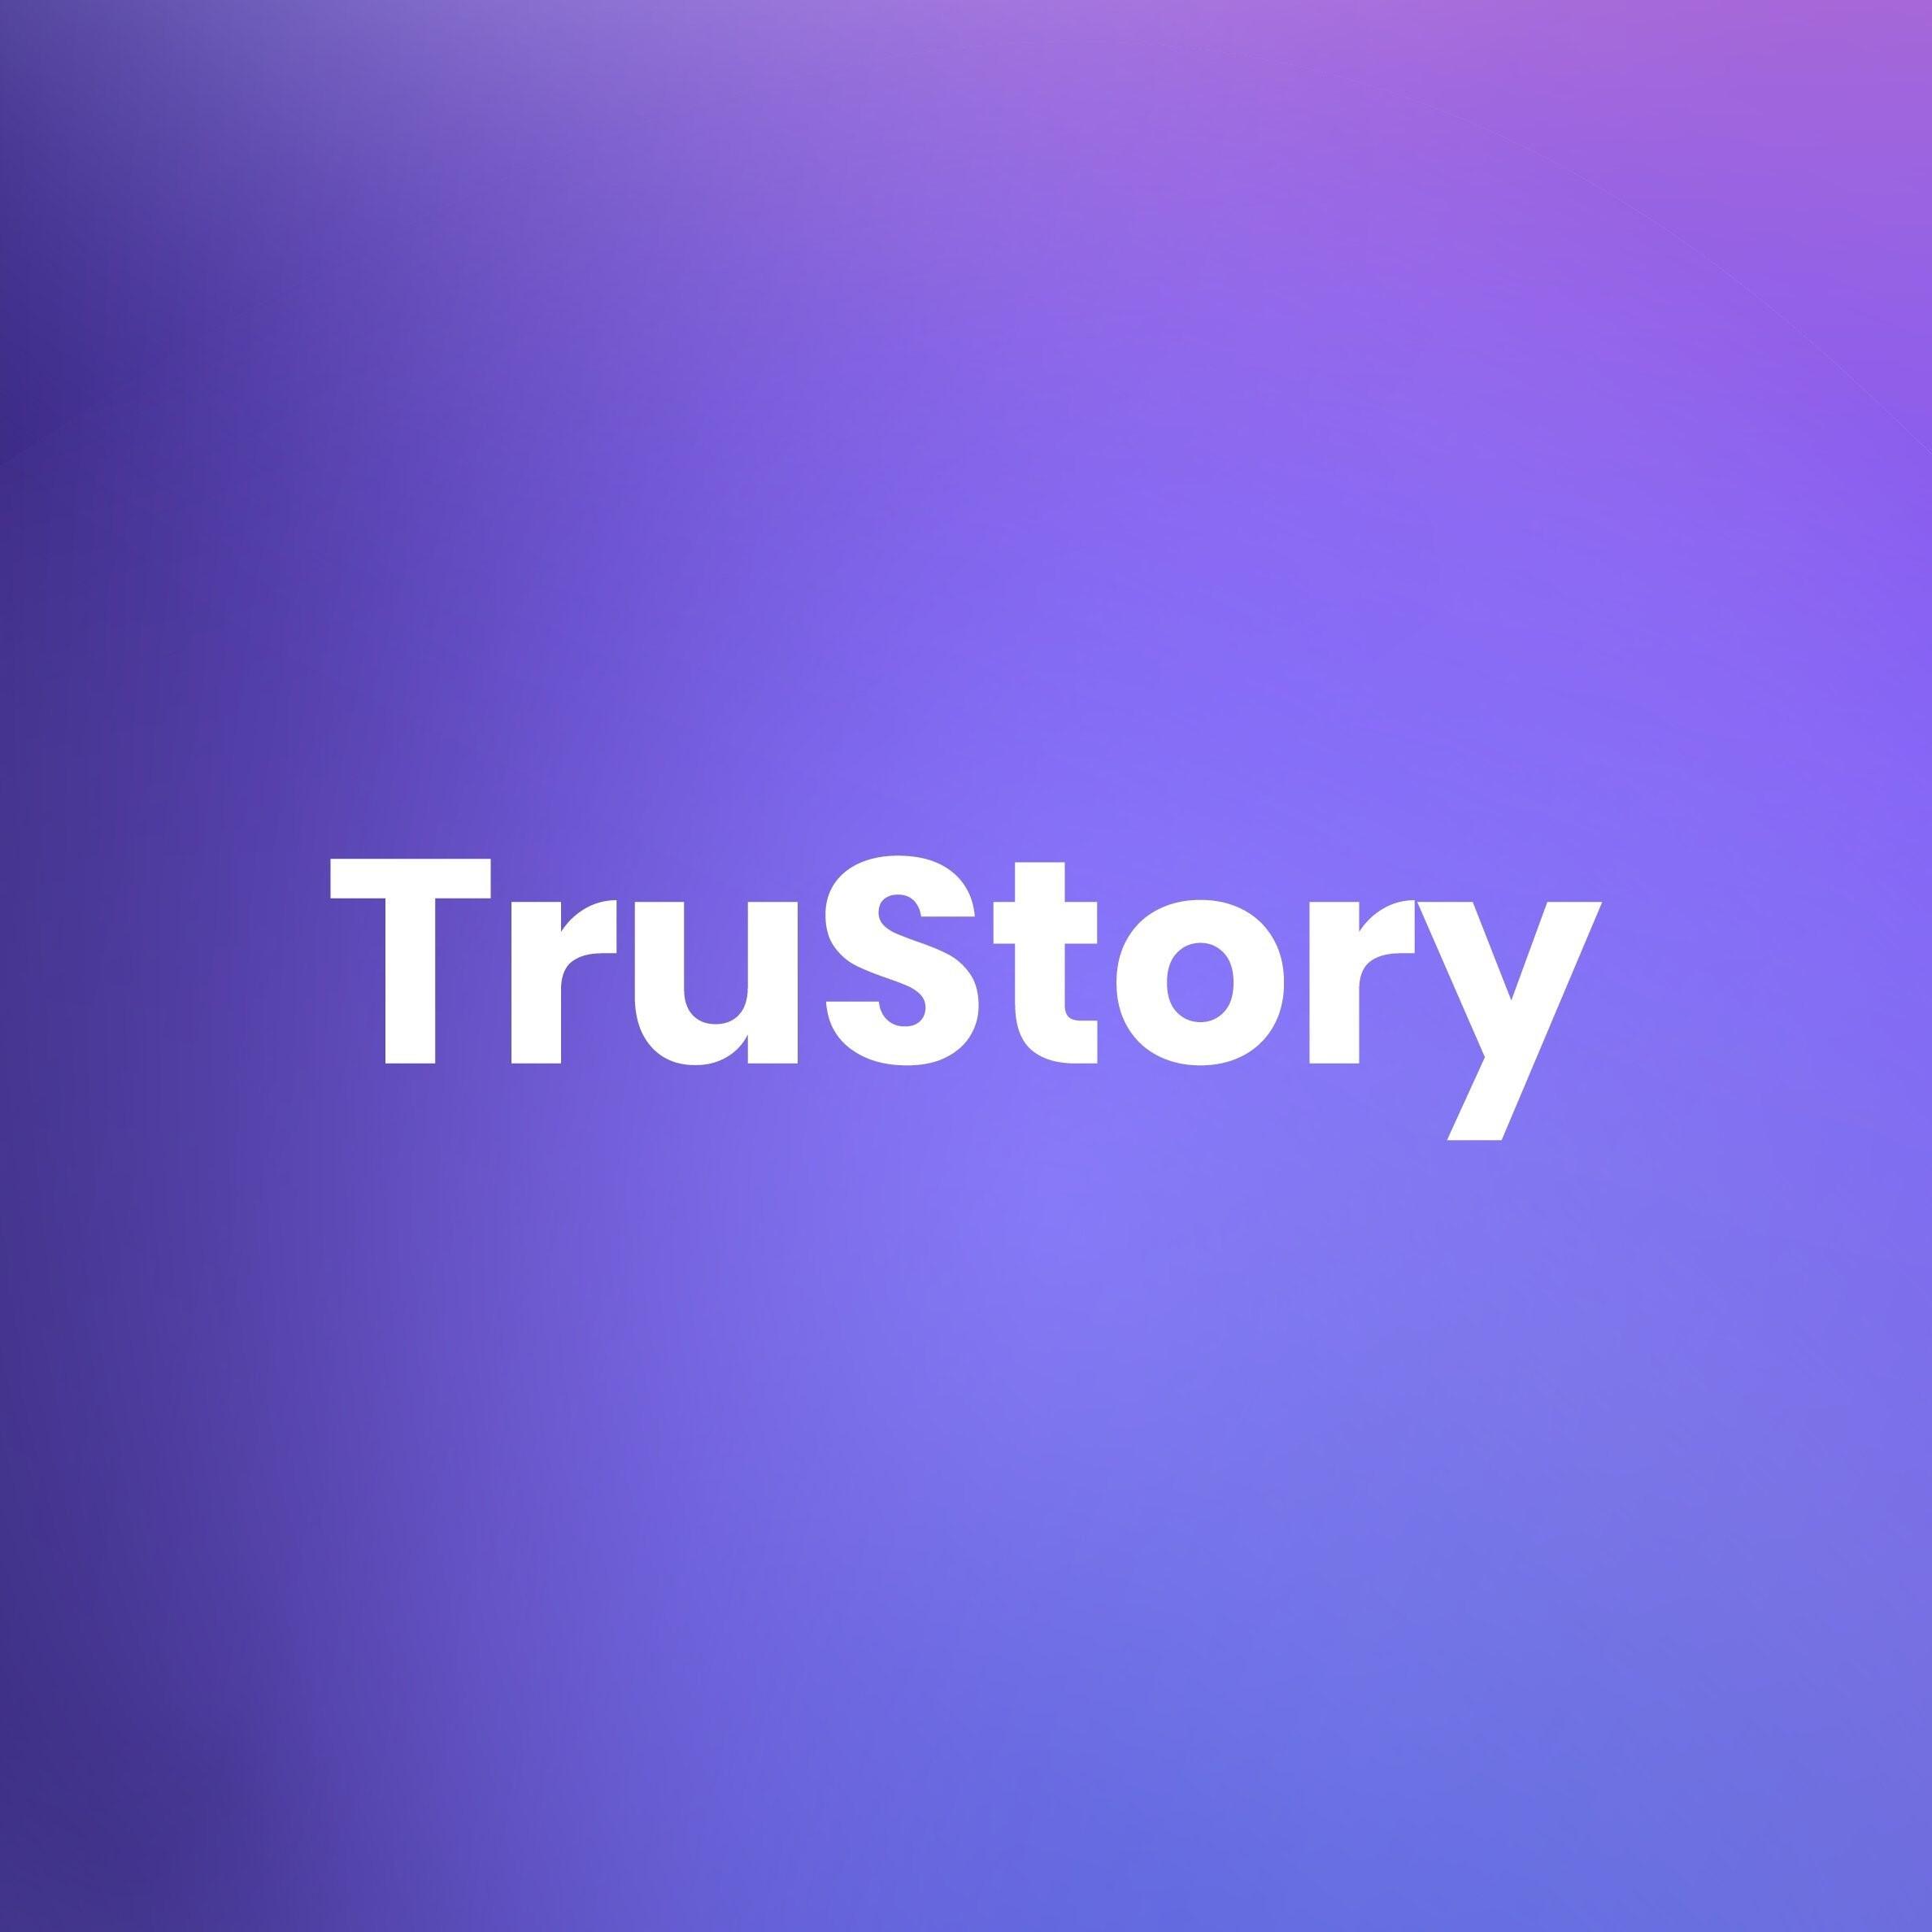 TruStory